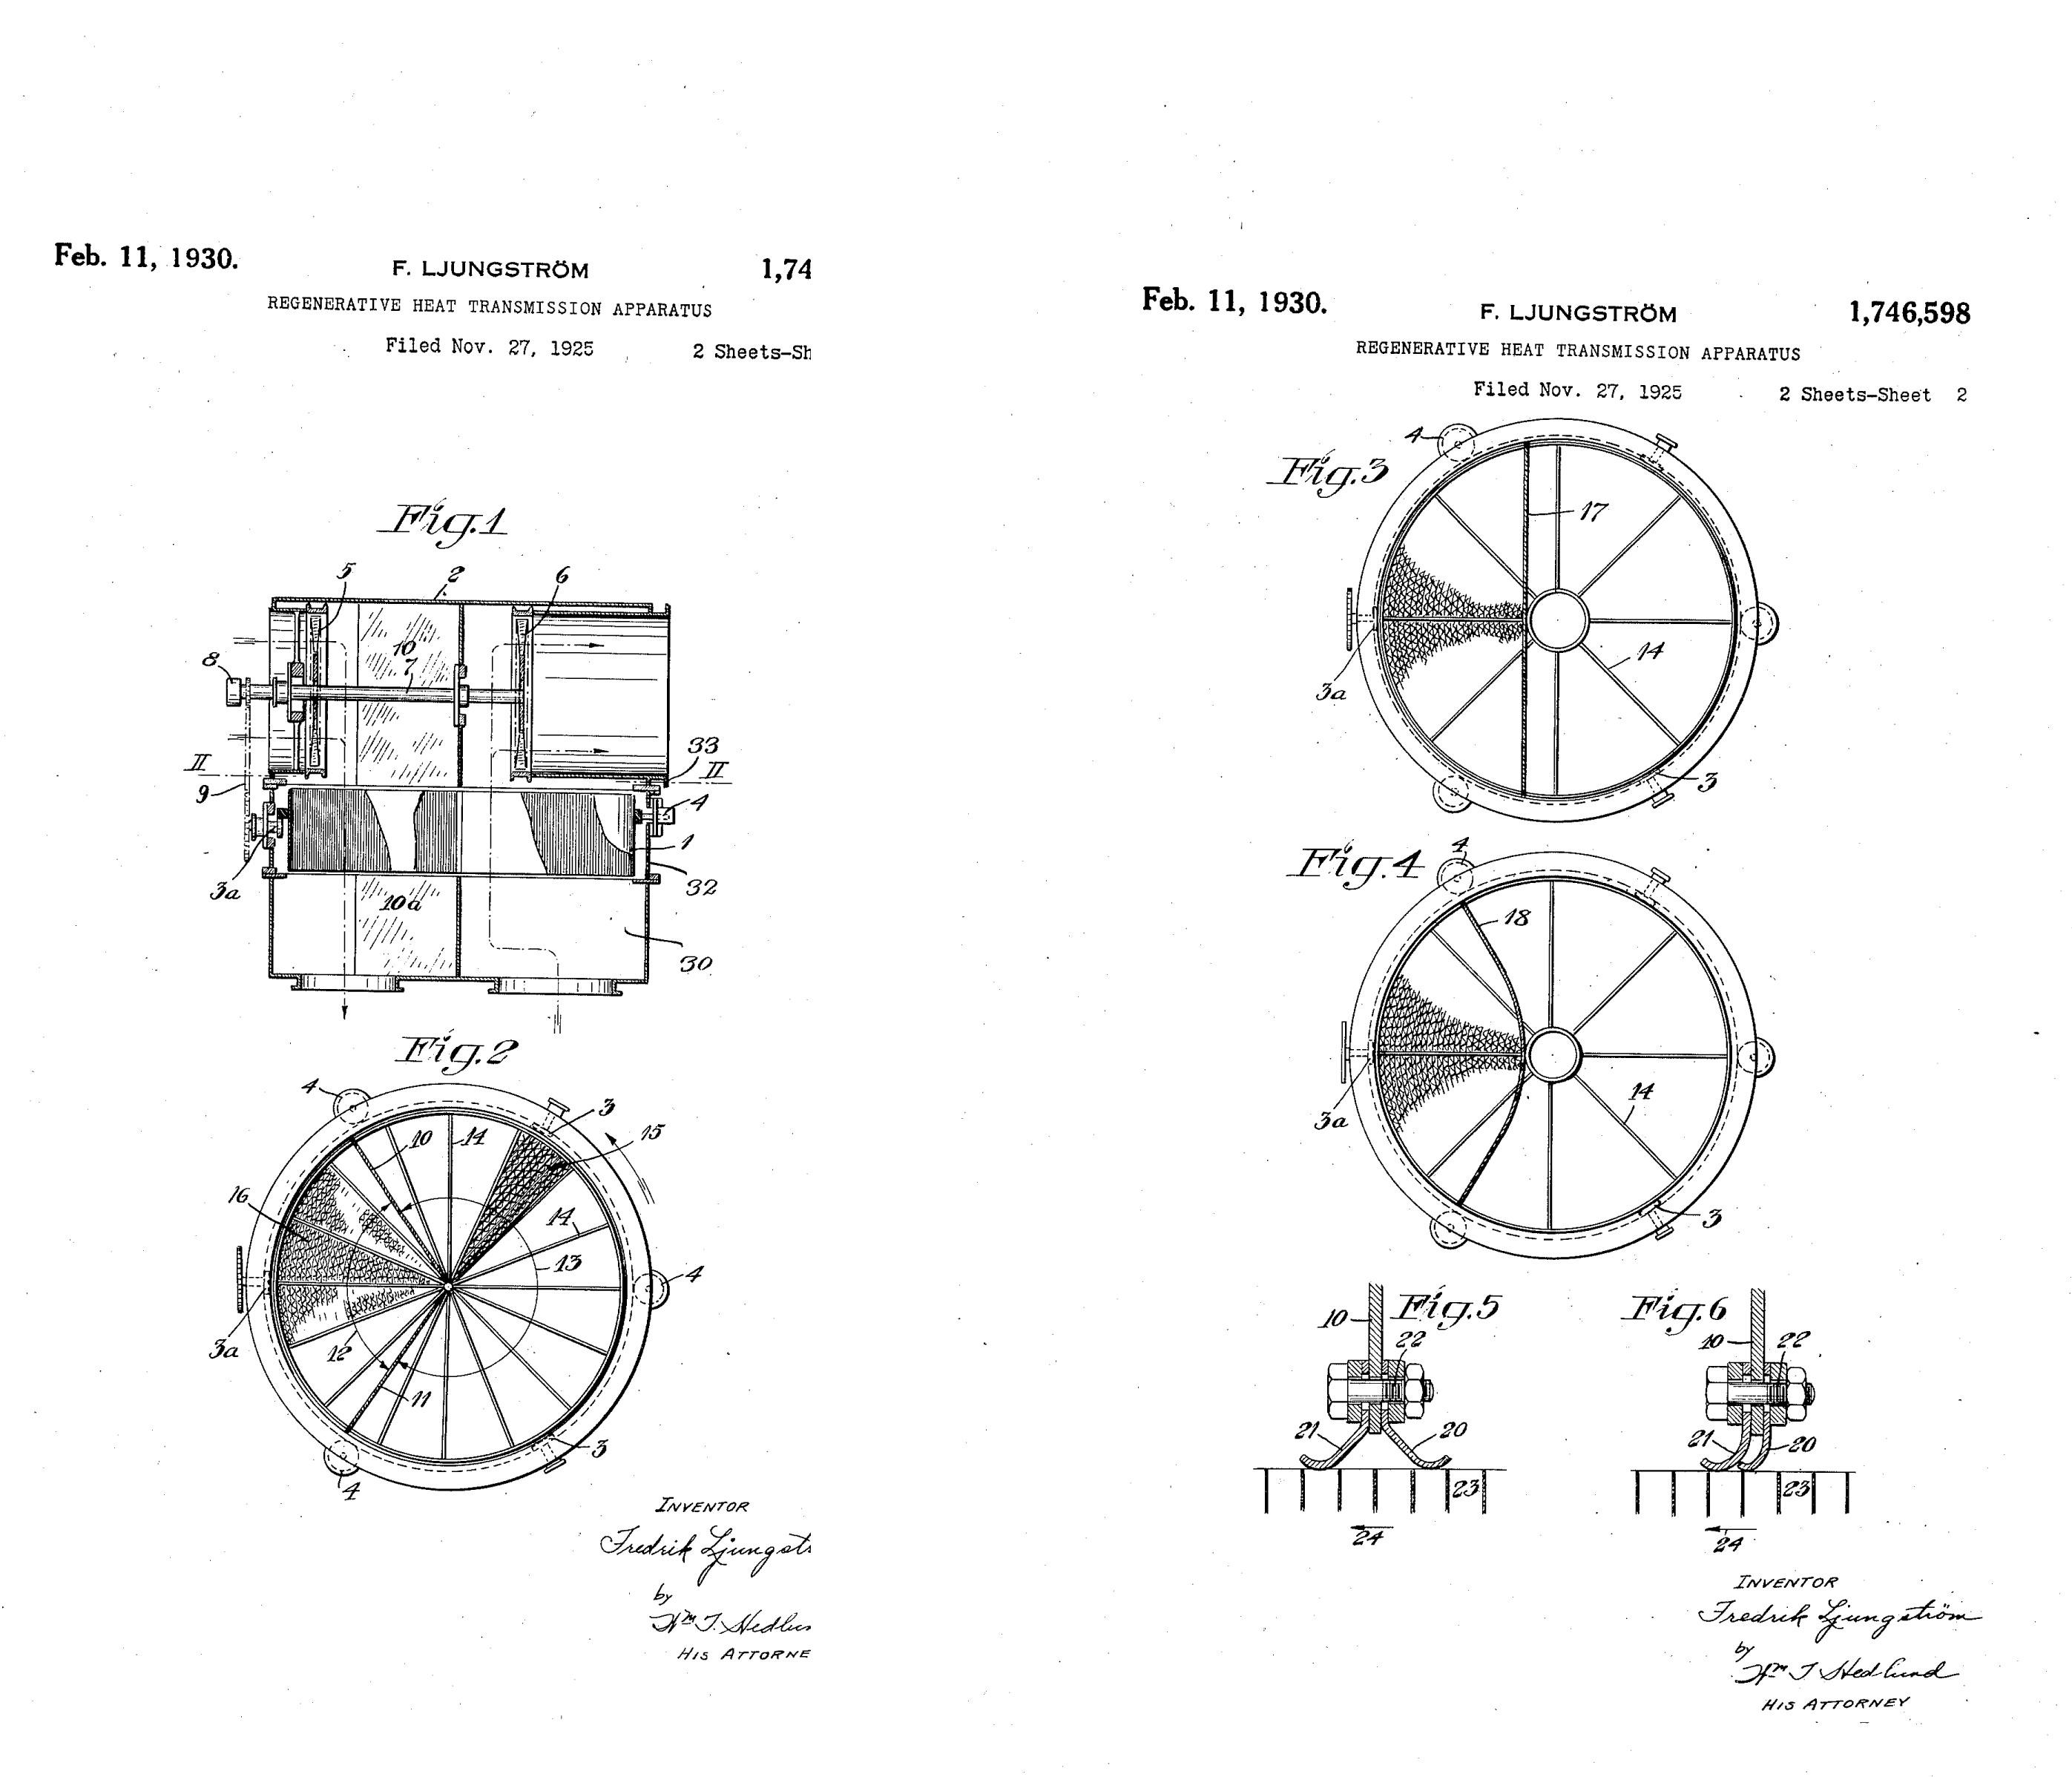 File Ljungstrom Regenerative Heat Transmission Apparatus